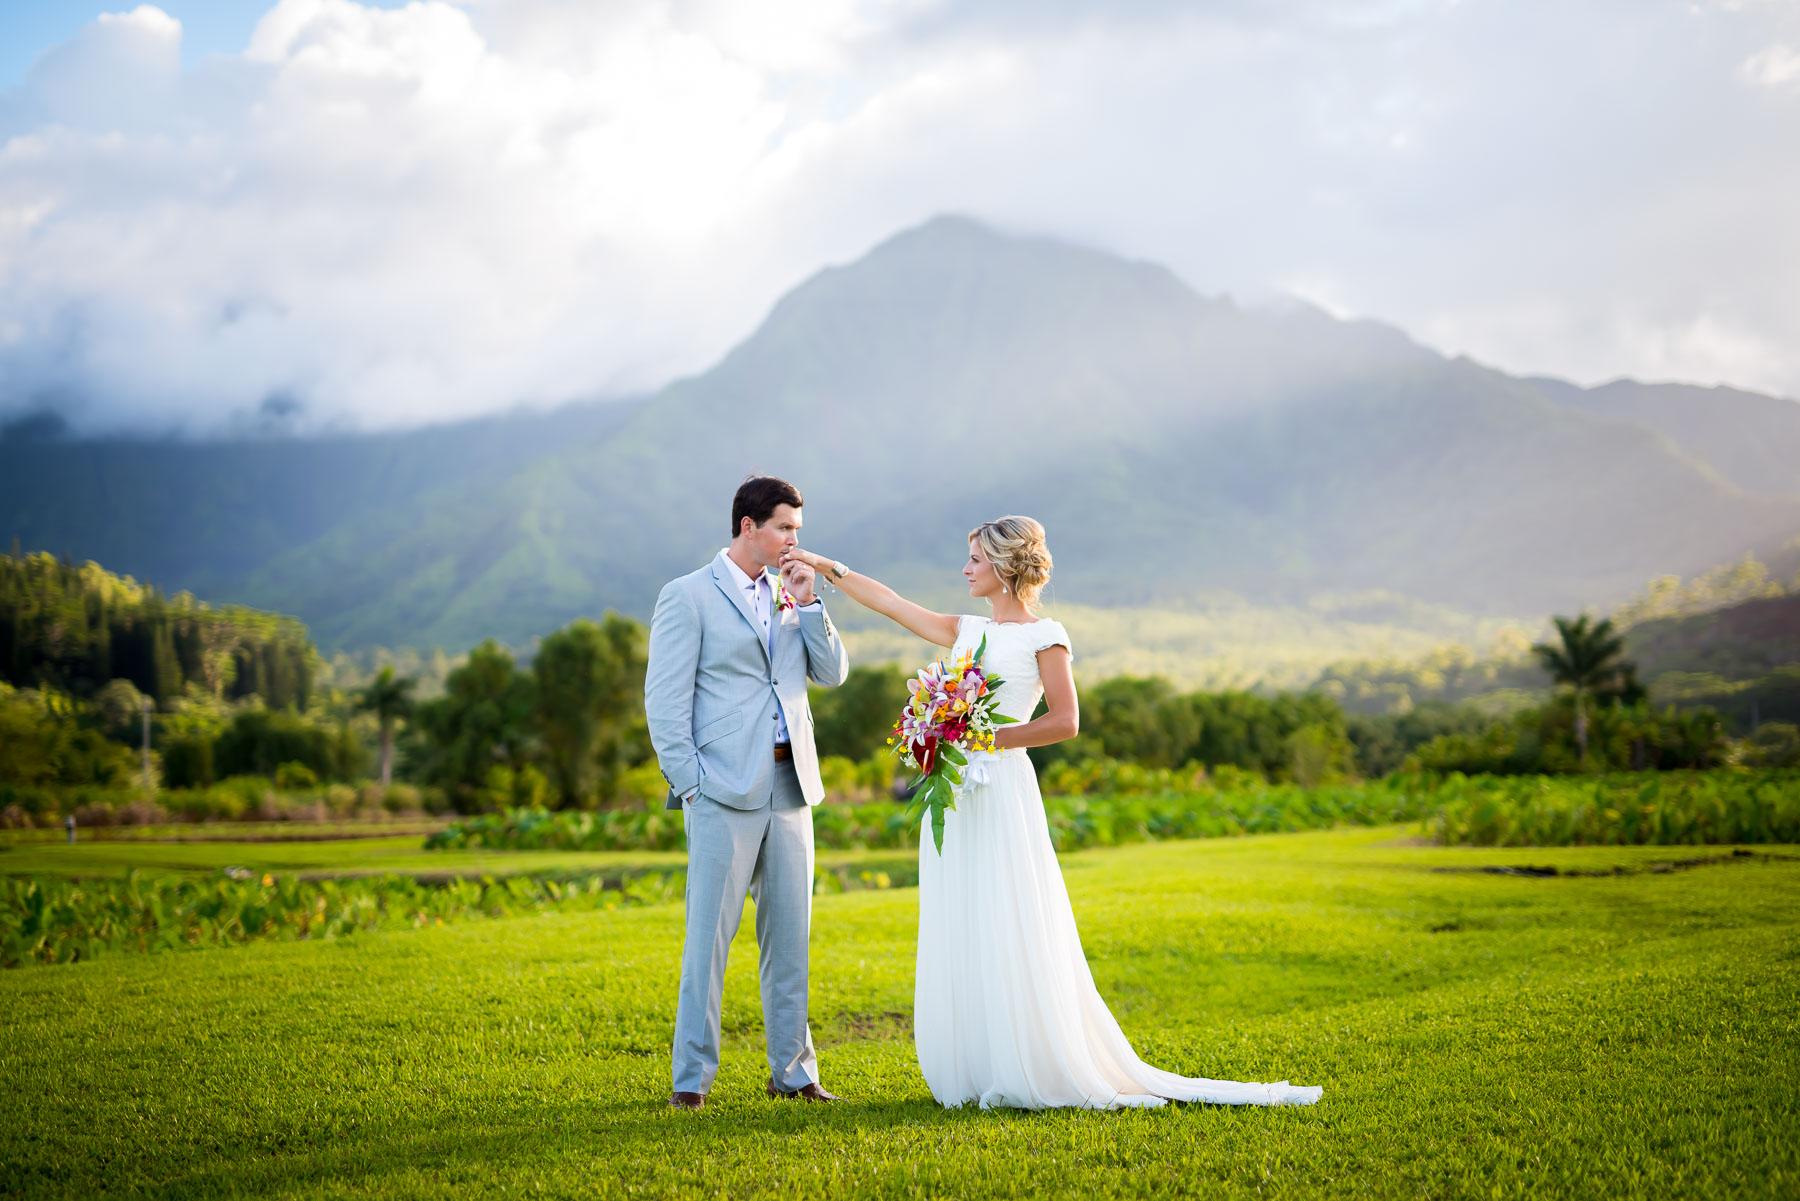 Beautiful sunset wedding photography on the North Shore of Kauai.